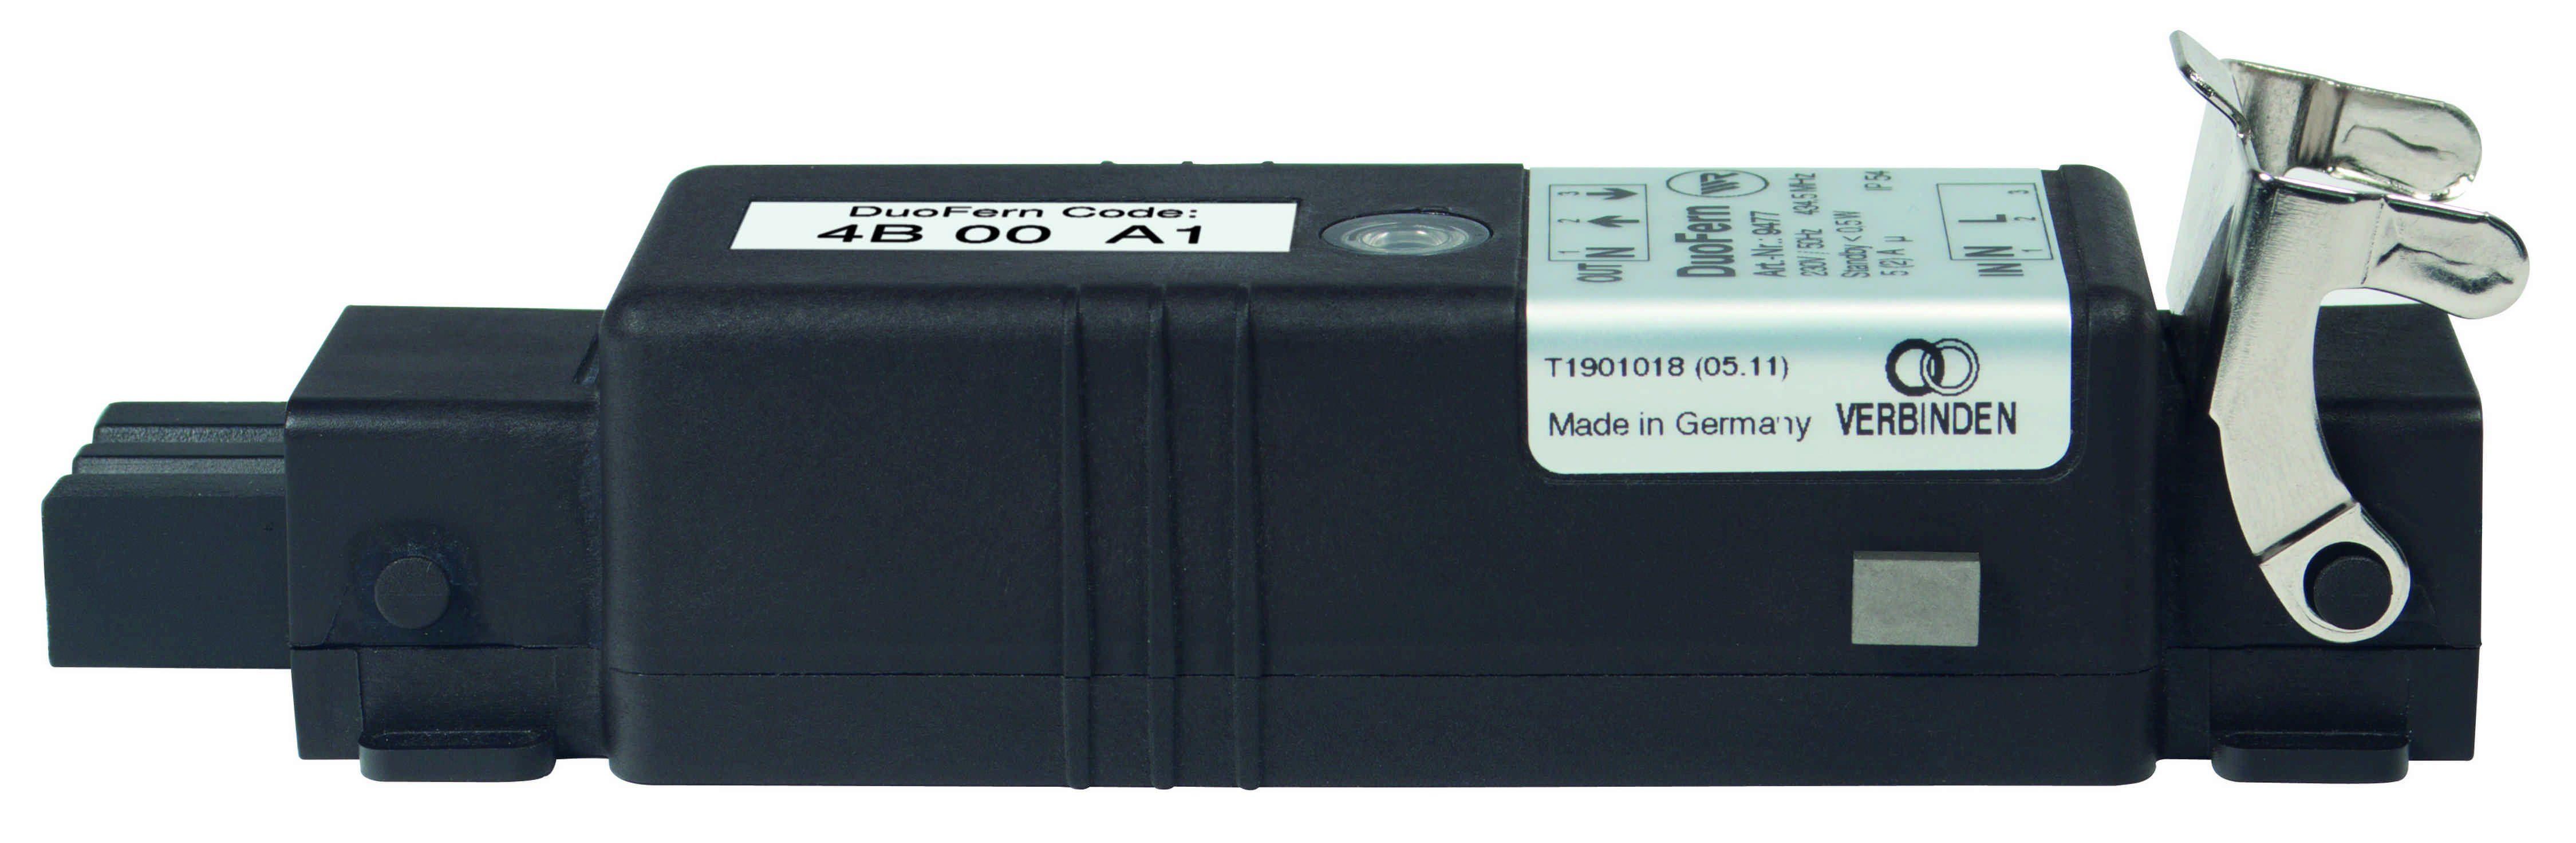 Rademacher Smart Home - Connect-Aktor, Funkempfänger »DuoFern - 9477«